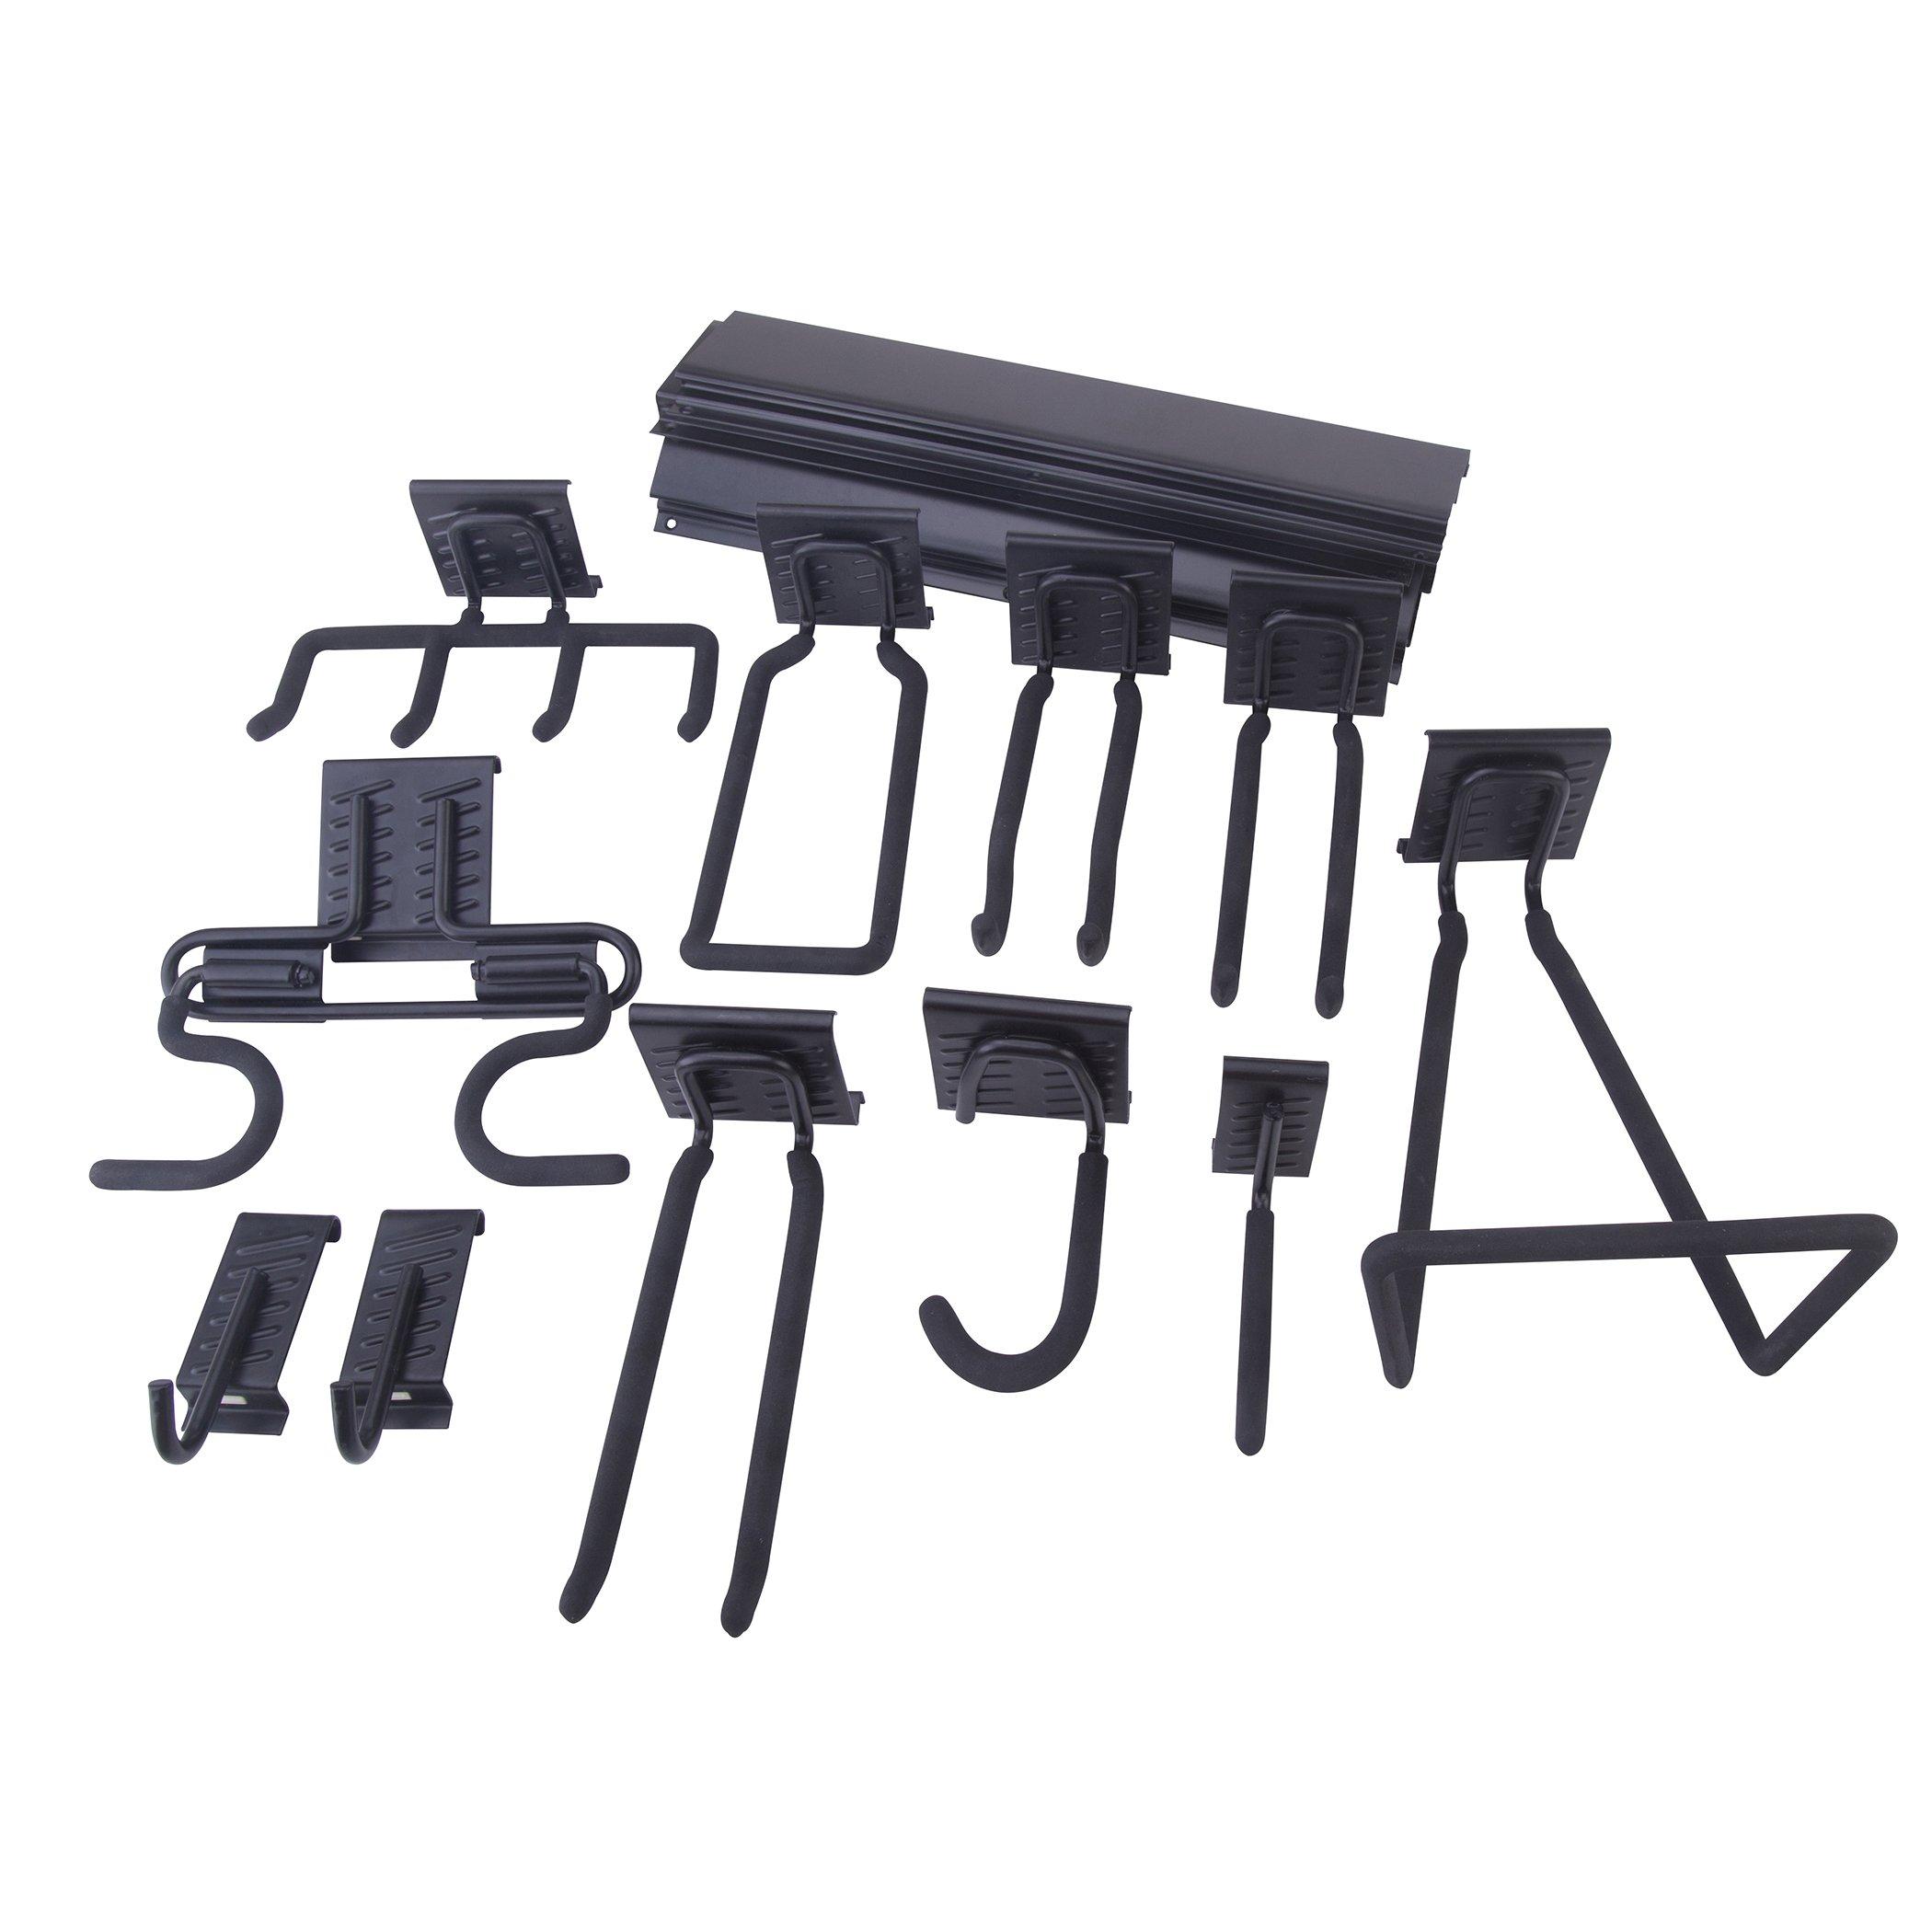 Topline 18-Piece Heavy Duty Garage Storage Utility Hooks Rack Set Multi-Tools Wall Mount Organizer/Hanger Anti-Slip Coating